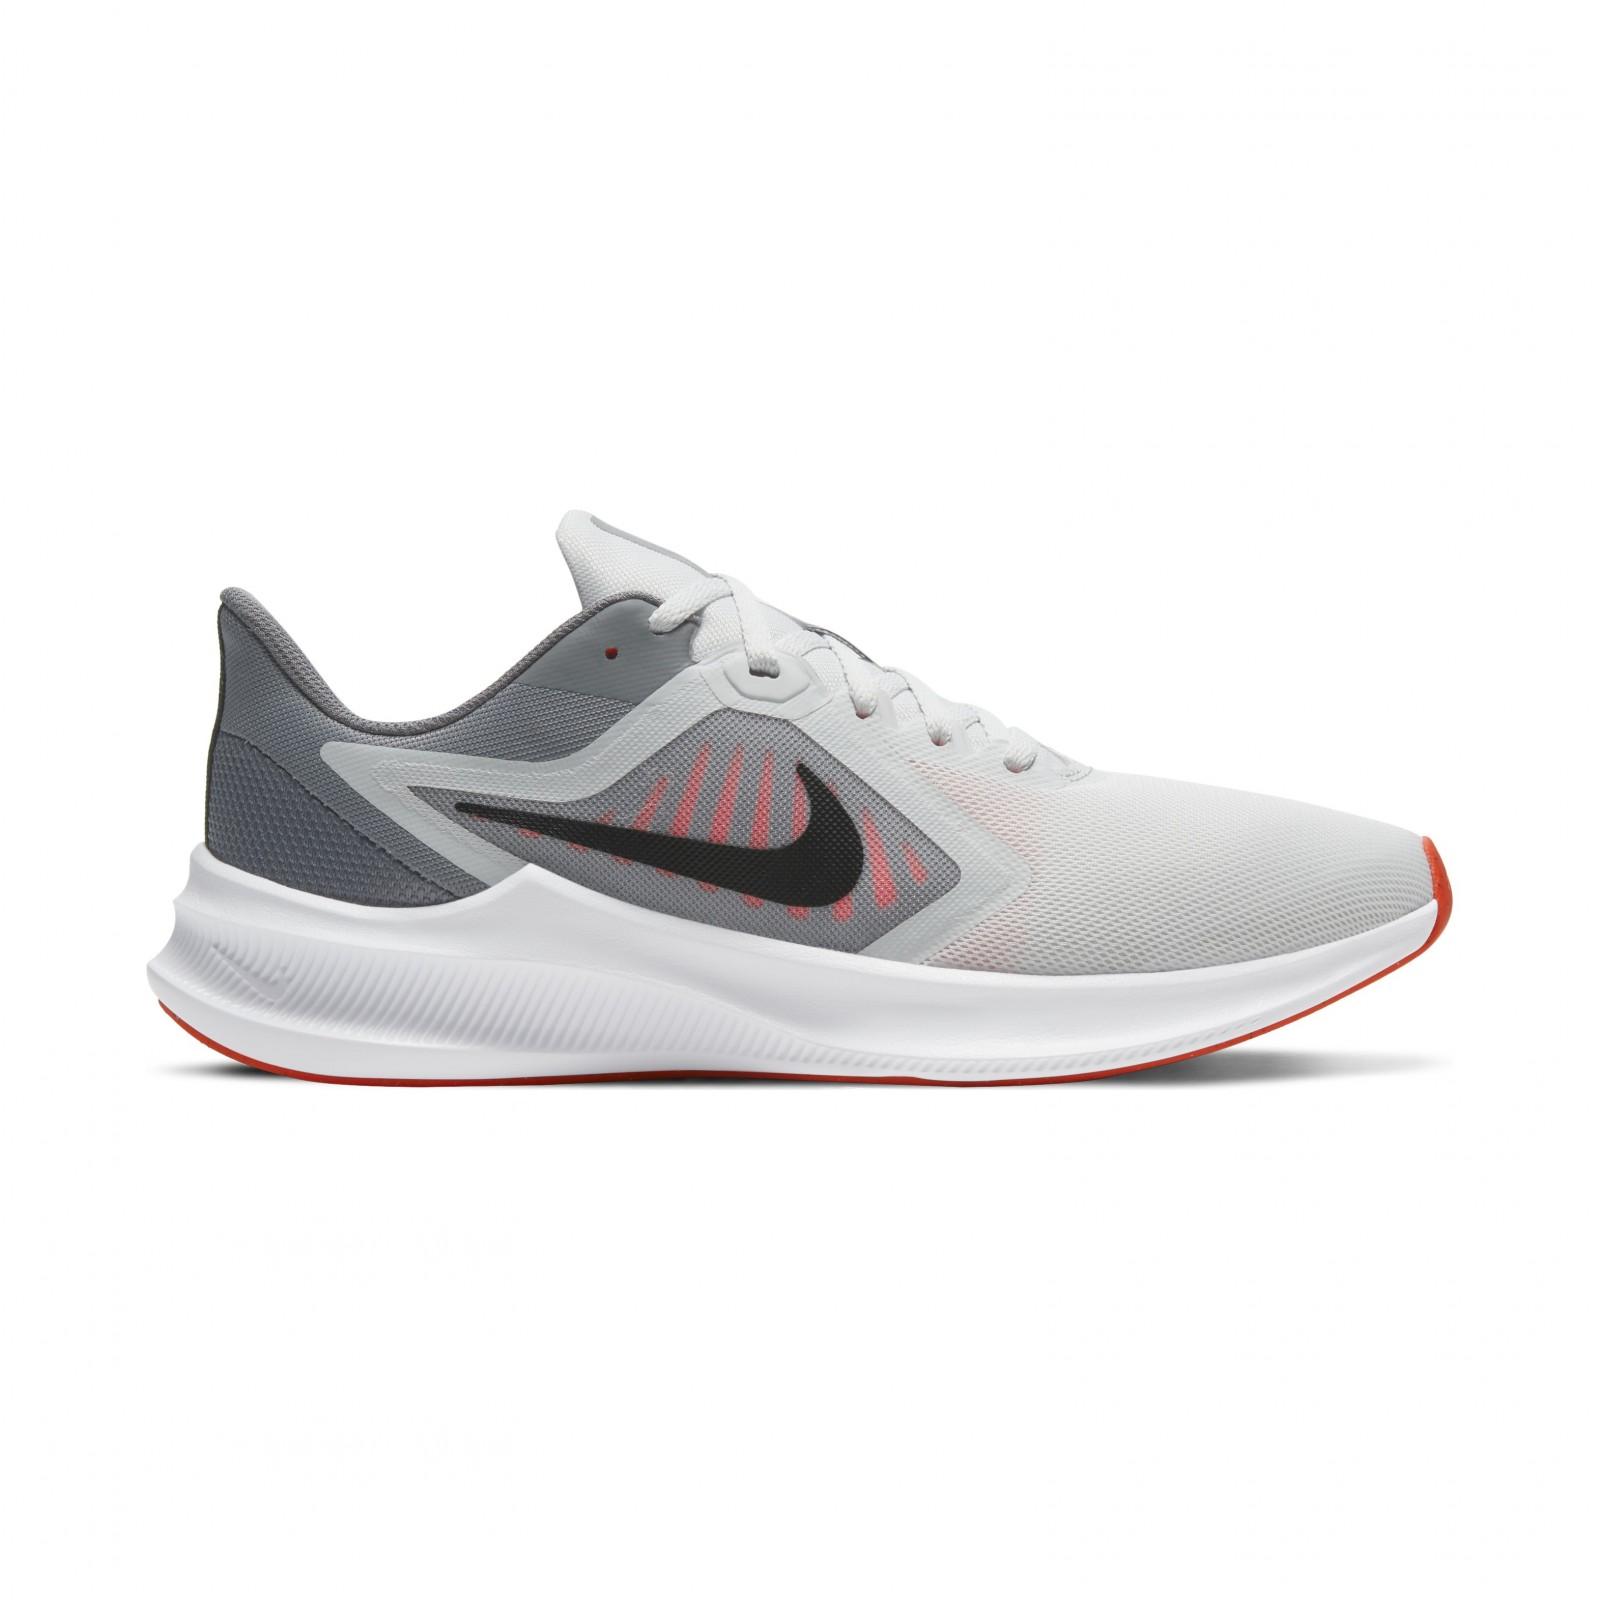 Nike Downshifter 10 PHOTON DUST/BLACK-BRIGHT CRIMSON